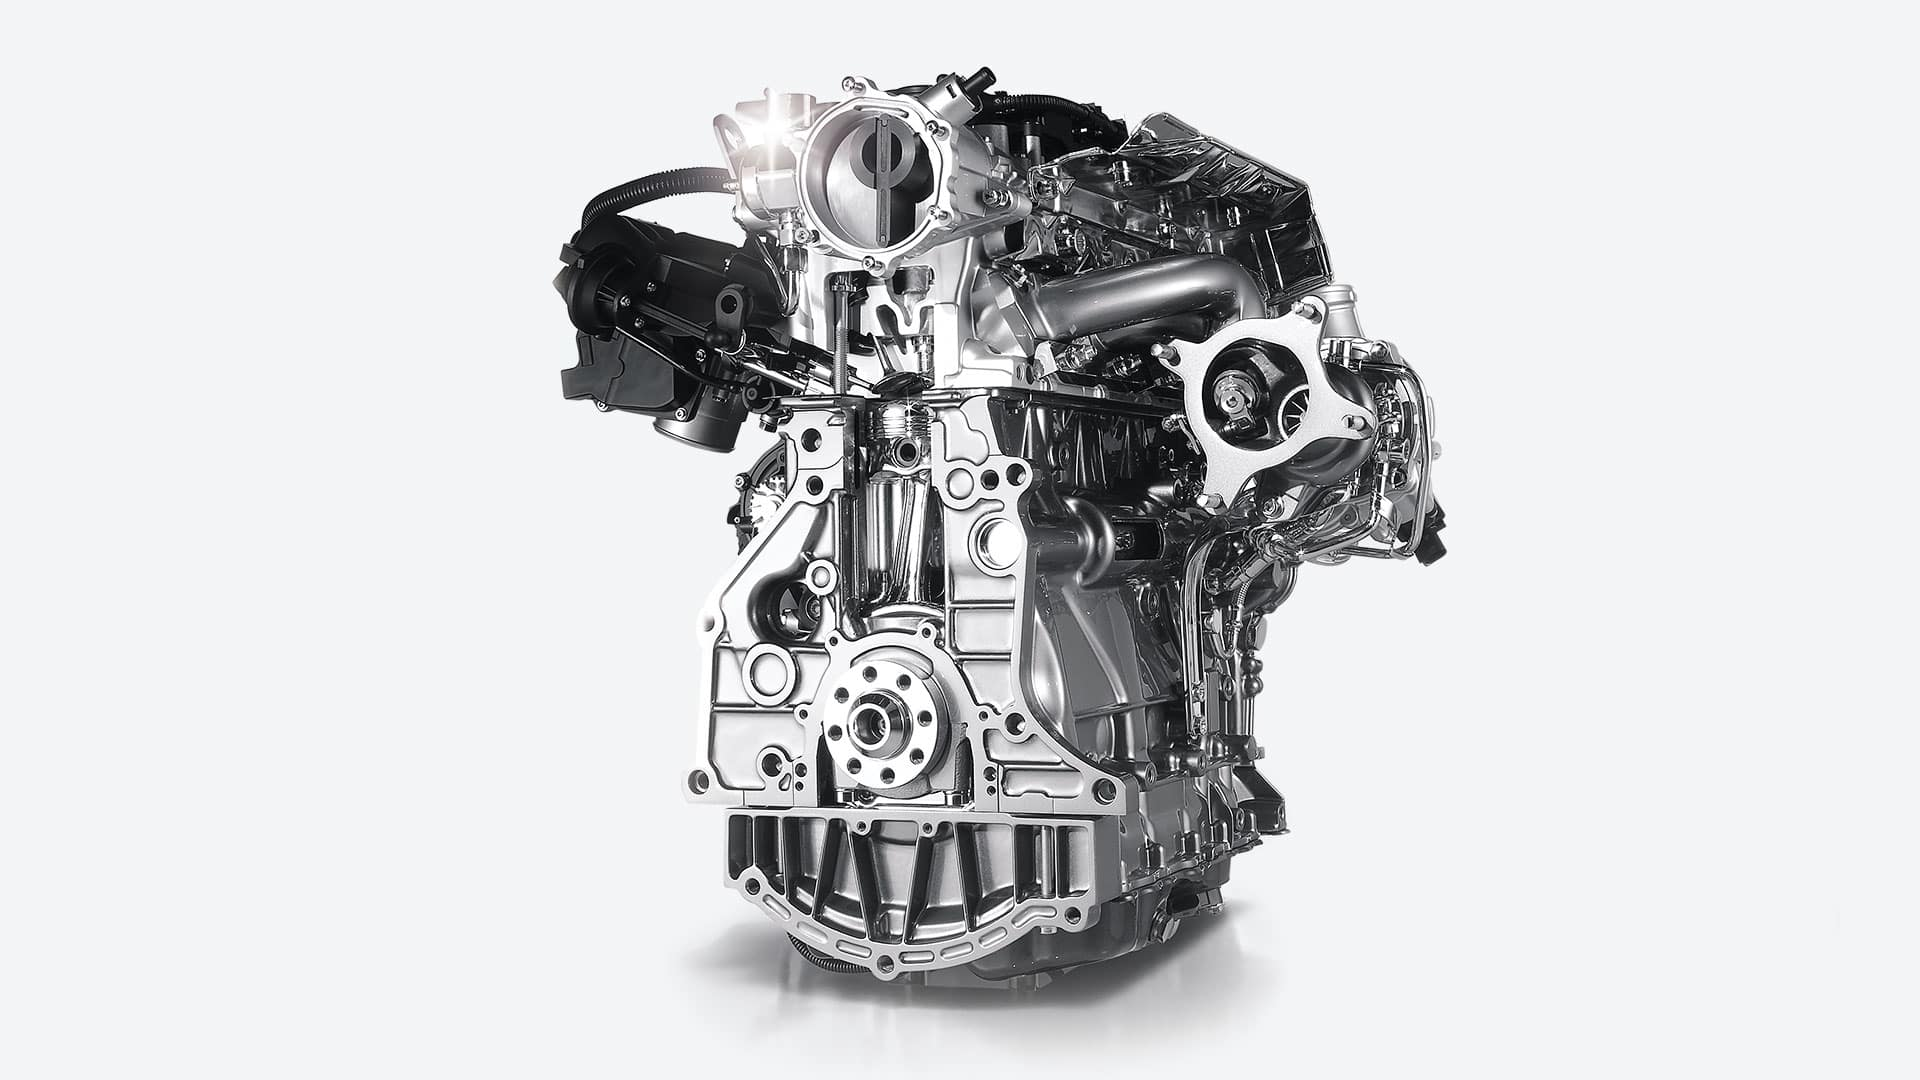 2019 VW Golf GTI turbo engine